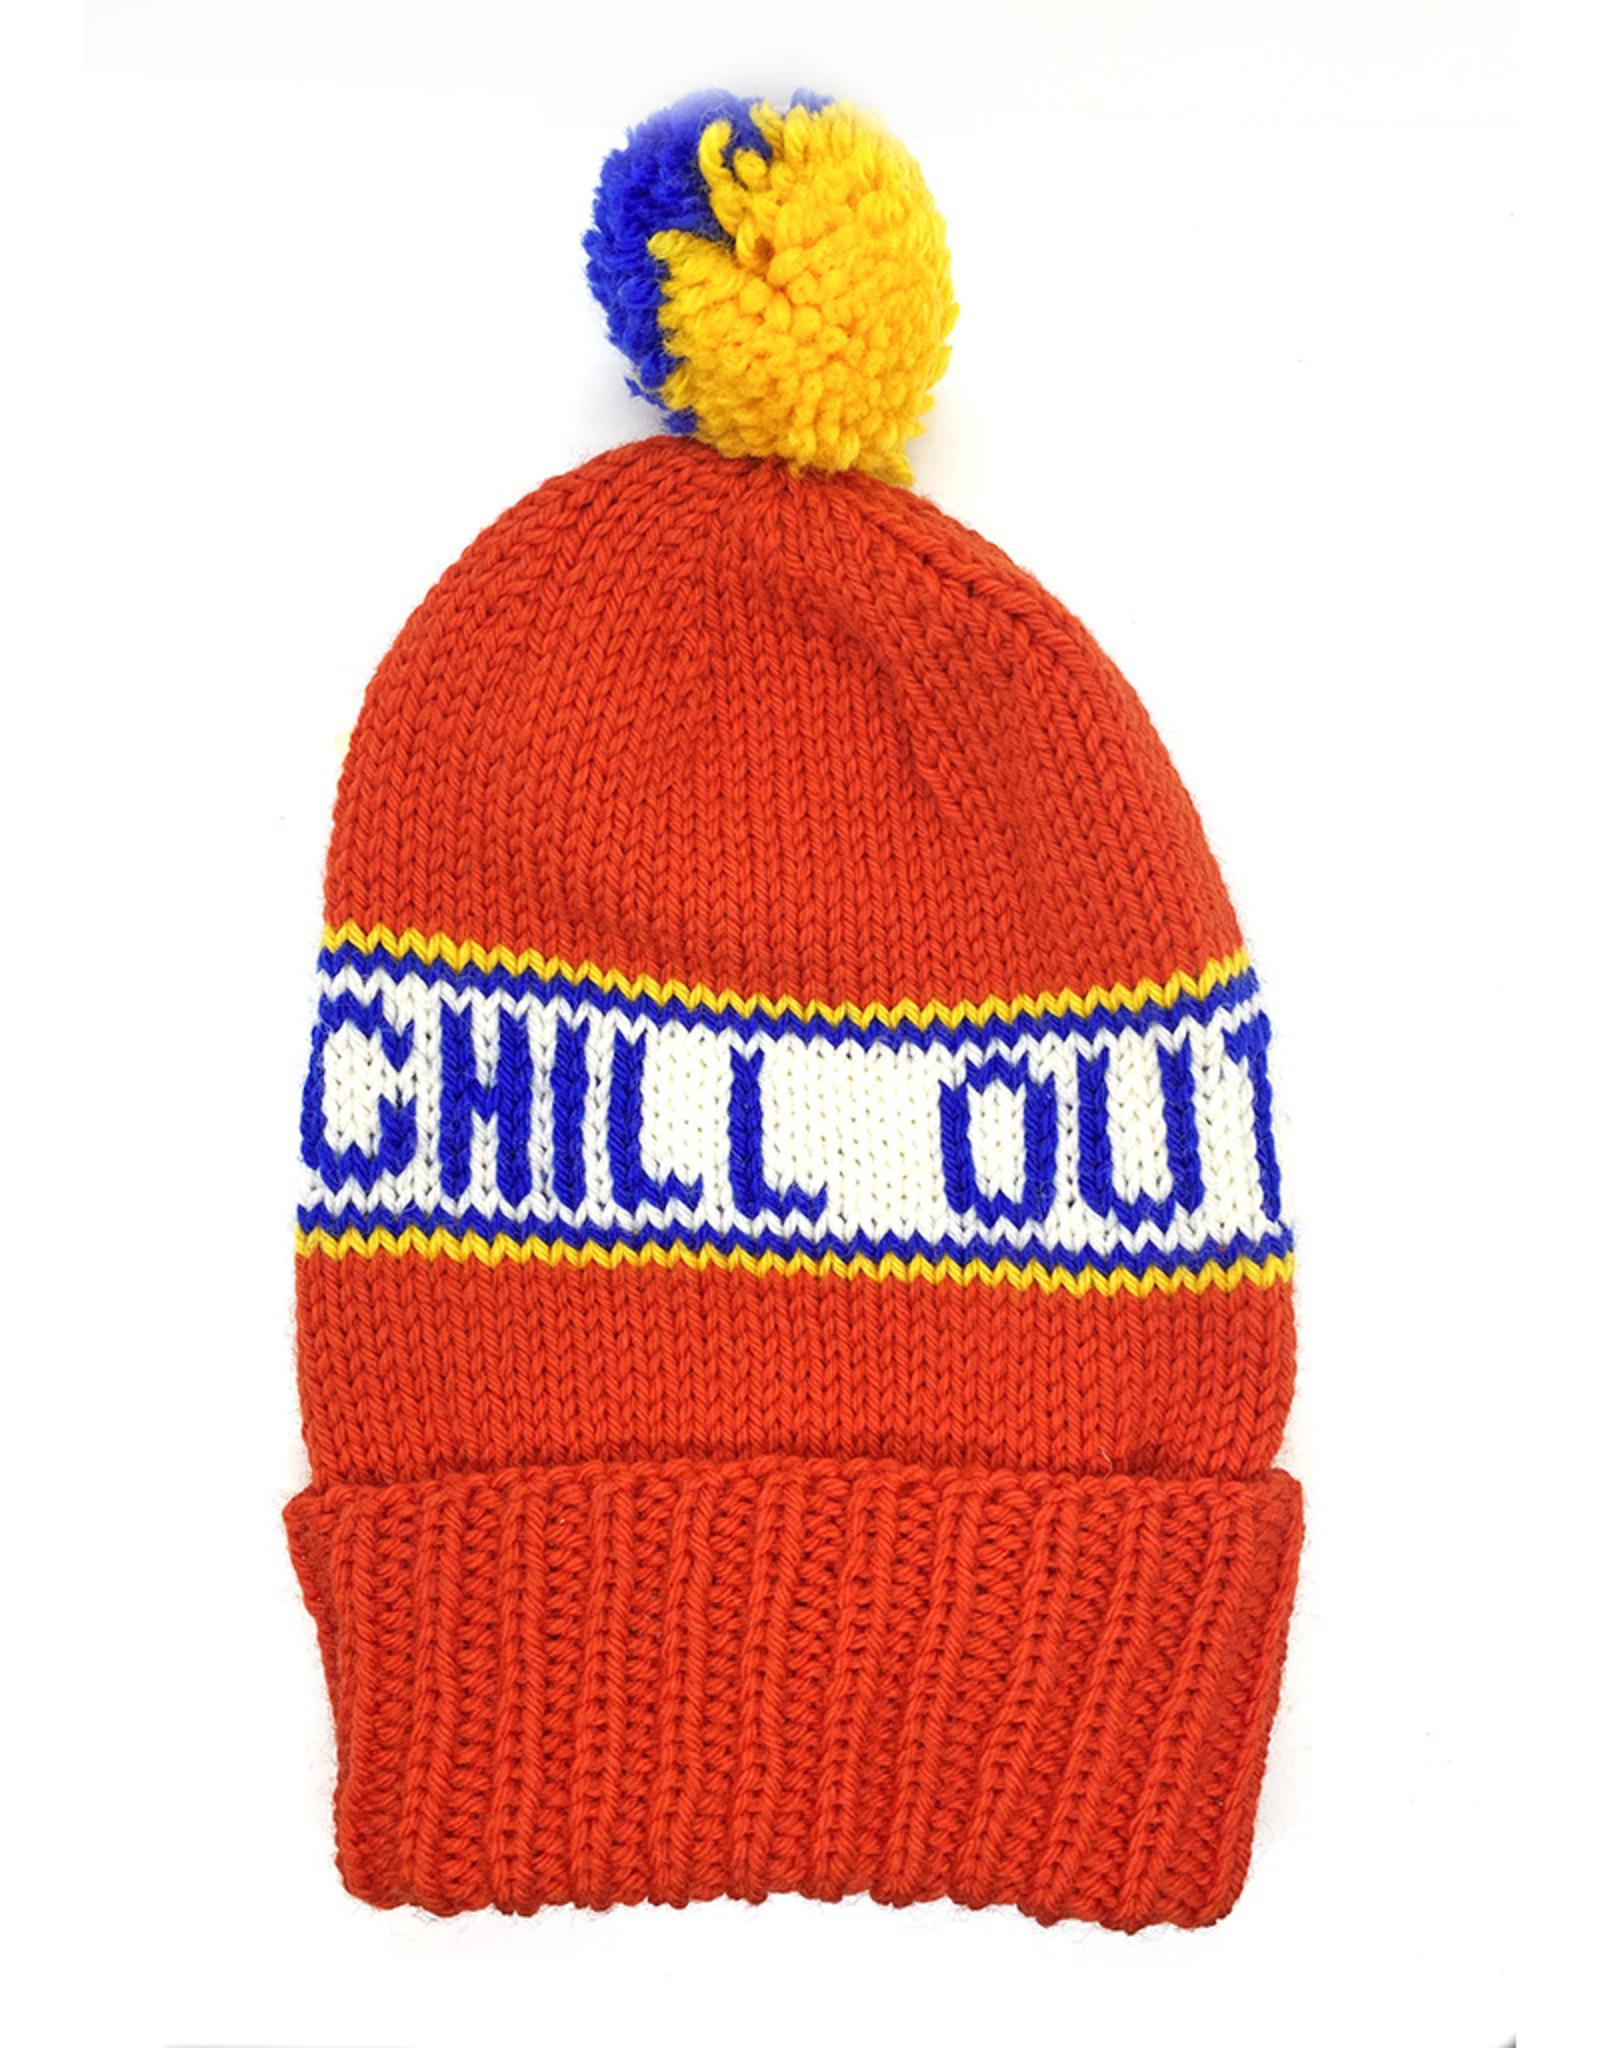 The Knit Hole Knit Hats by The Knit Hole